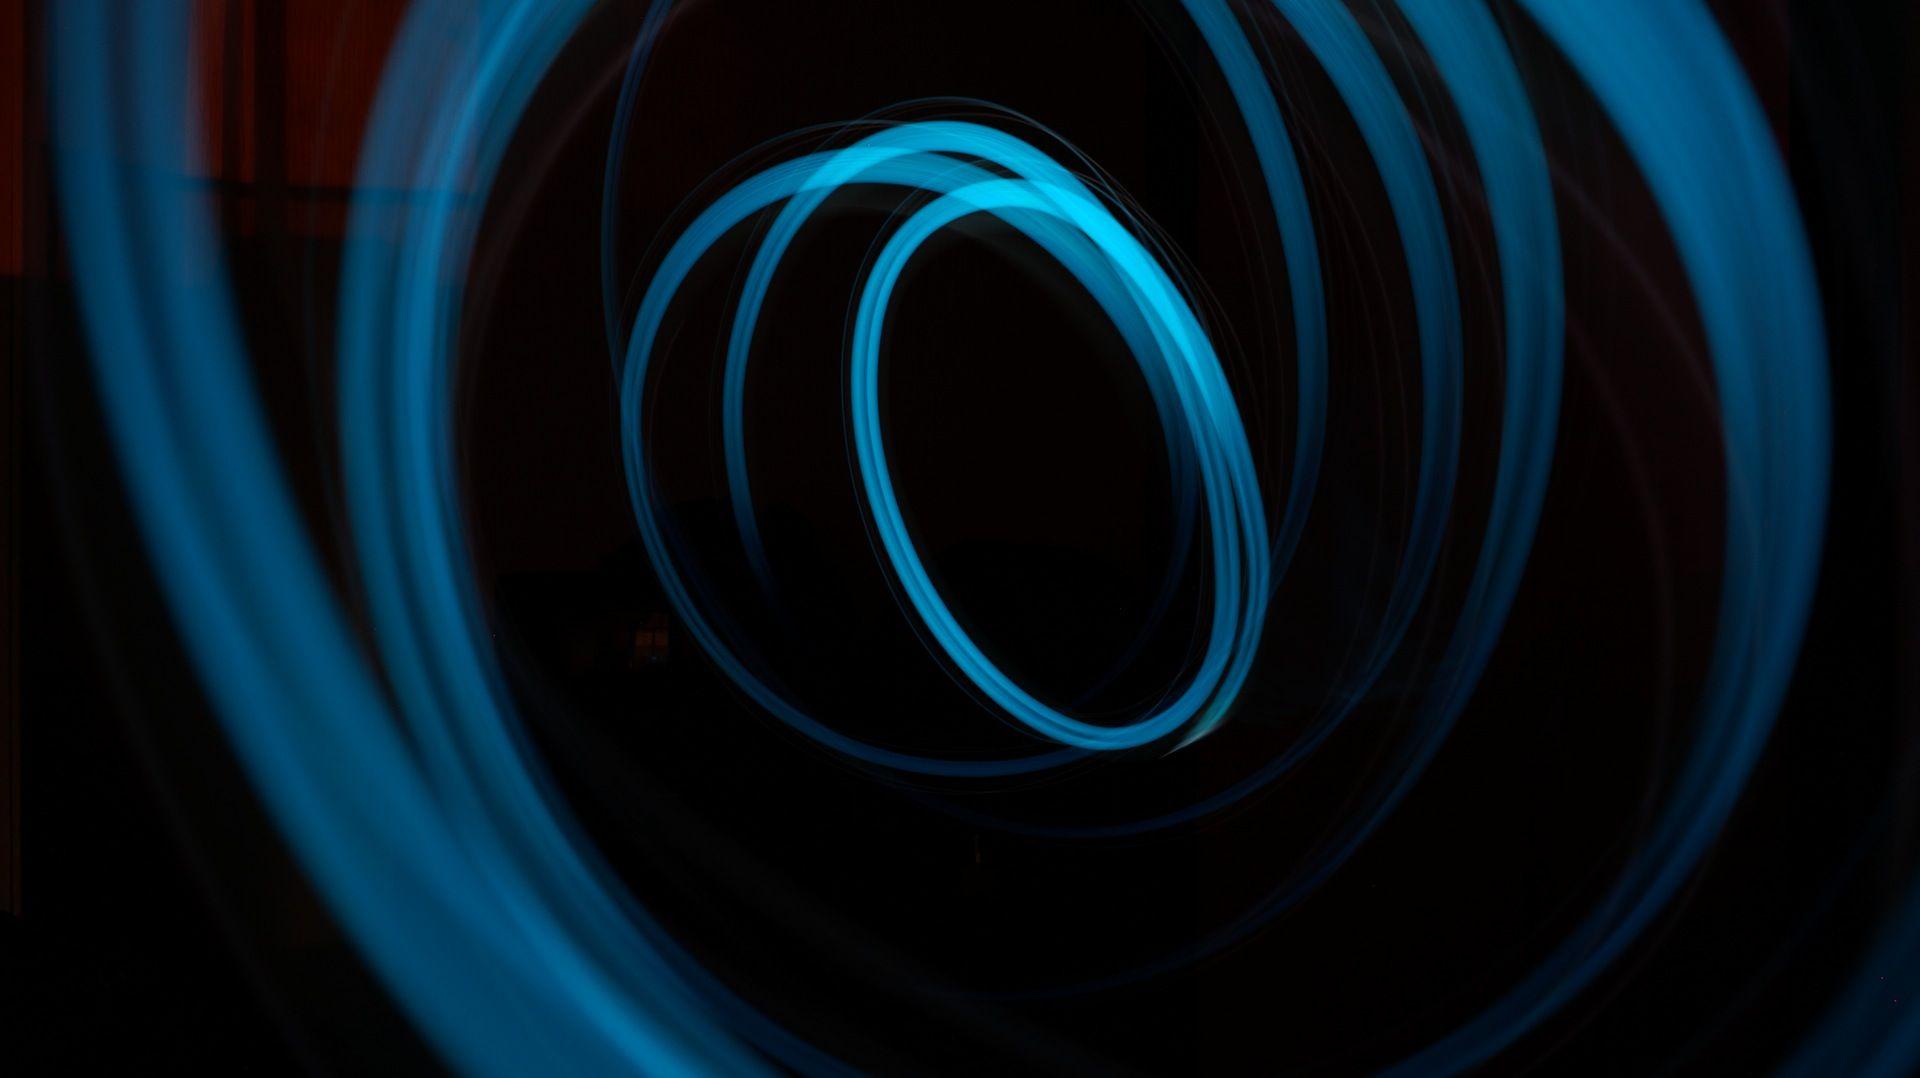 Luces oscuridad lneas arte azul fondos de pantalla hd luces oscuridad lneas arte azul fondos de pantalla hd professor voltagebd Image collections